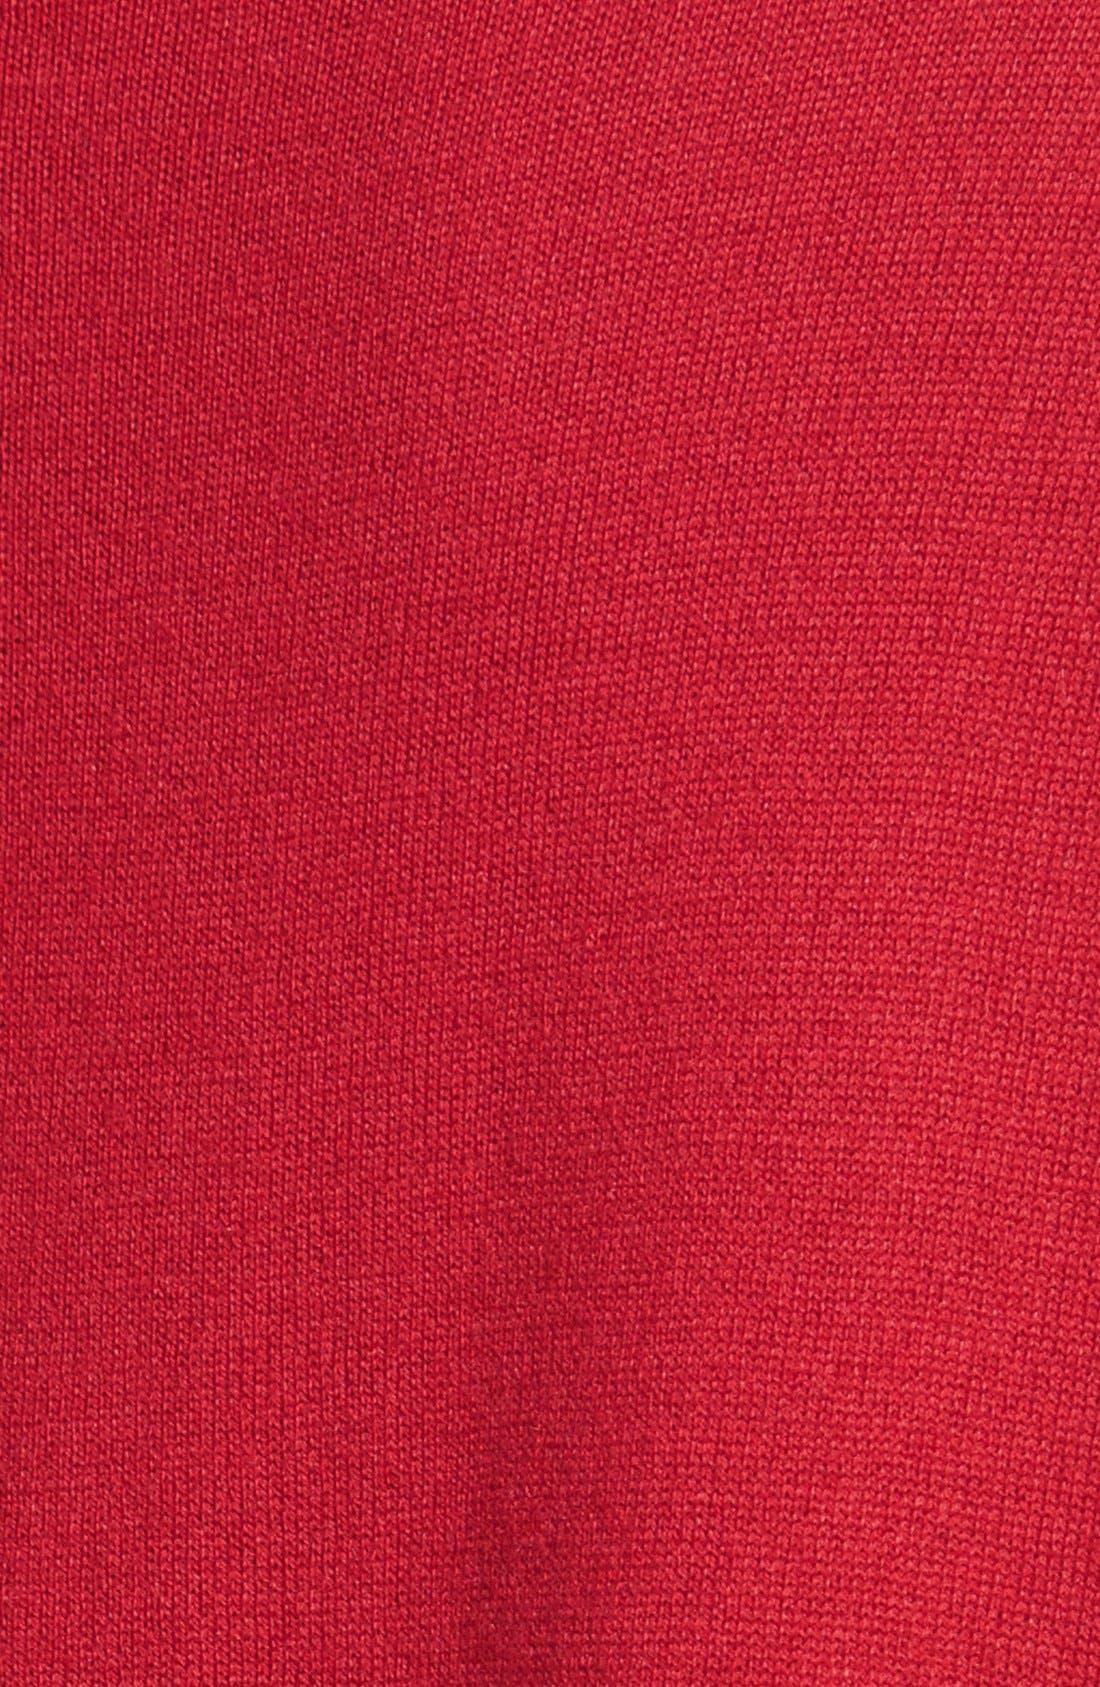 Alternate Image 3  - Vince CamutoRibbed Sleeve Mock Neck Sweater (Regular & Petite)